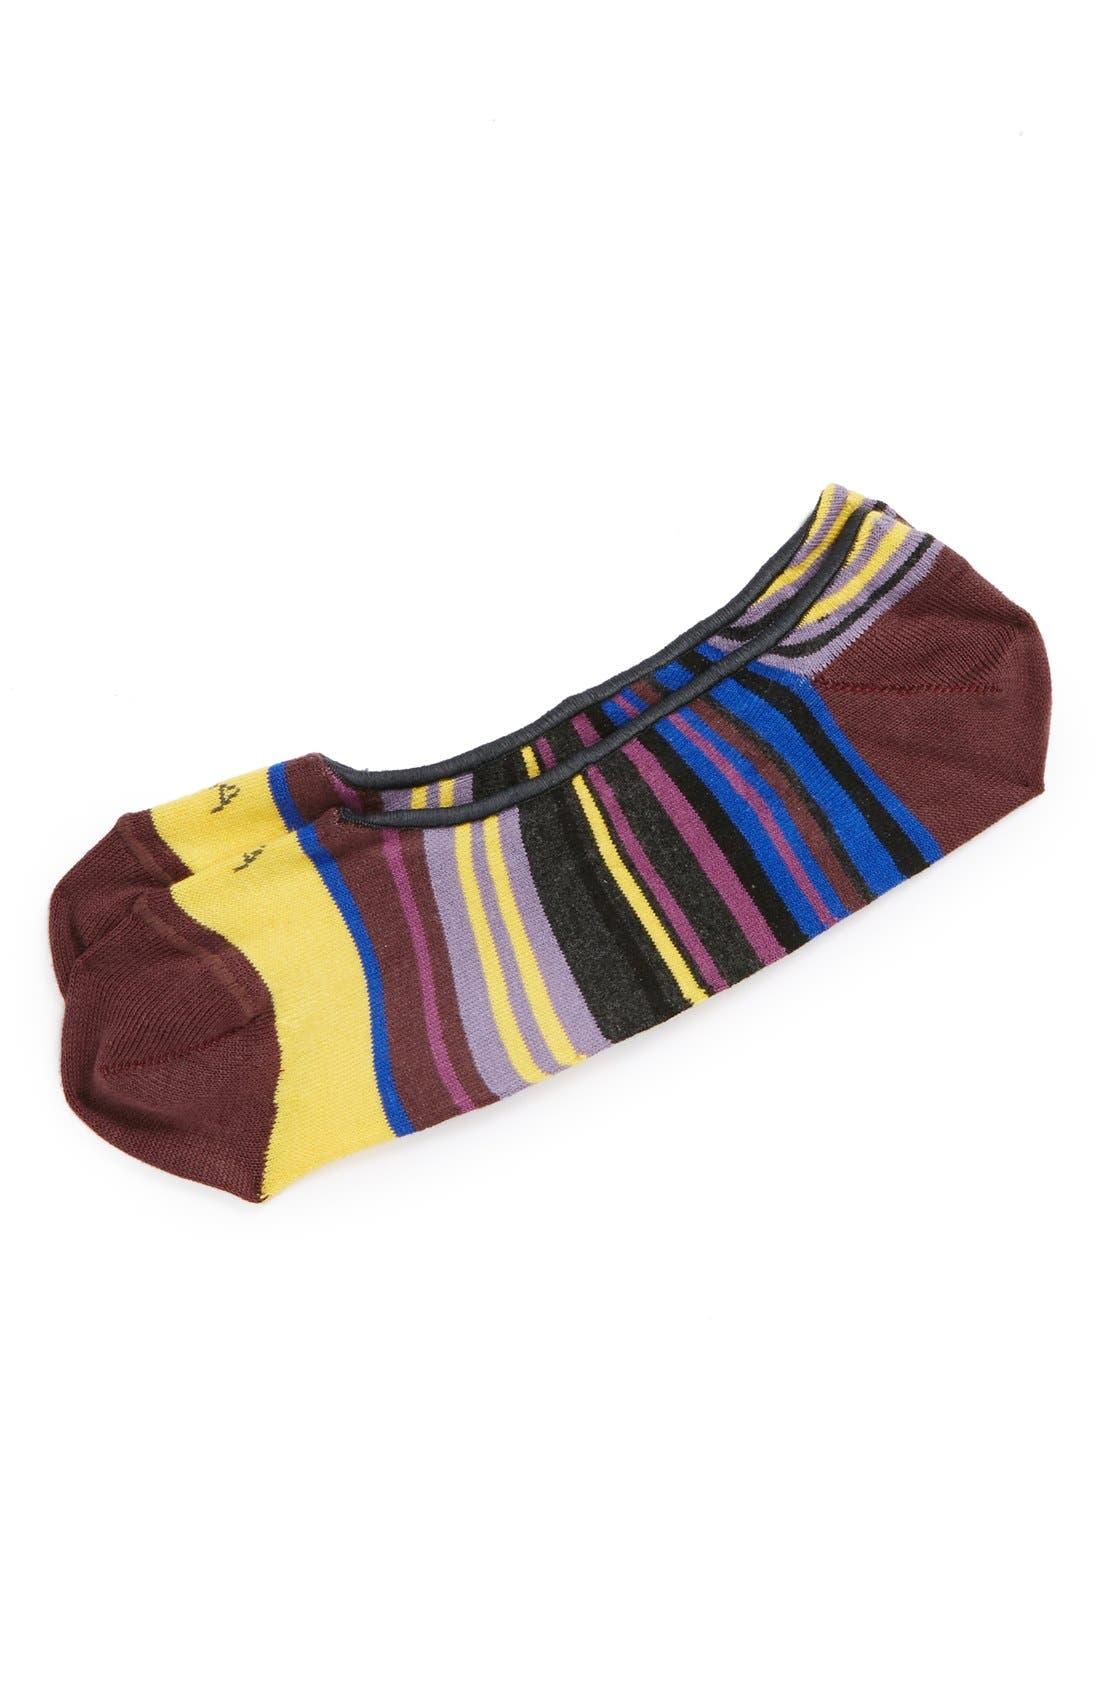 Alternate Image 1 Selected - hook + ALBERT 'Lilly Stripe' No-Show Socks